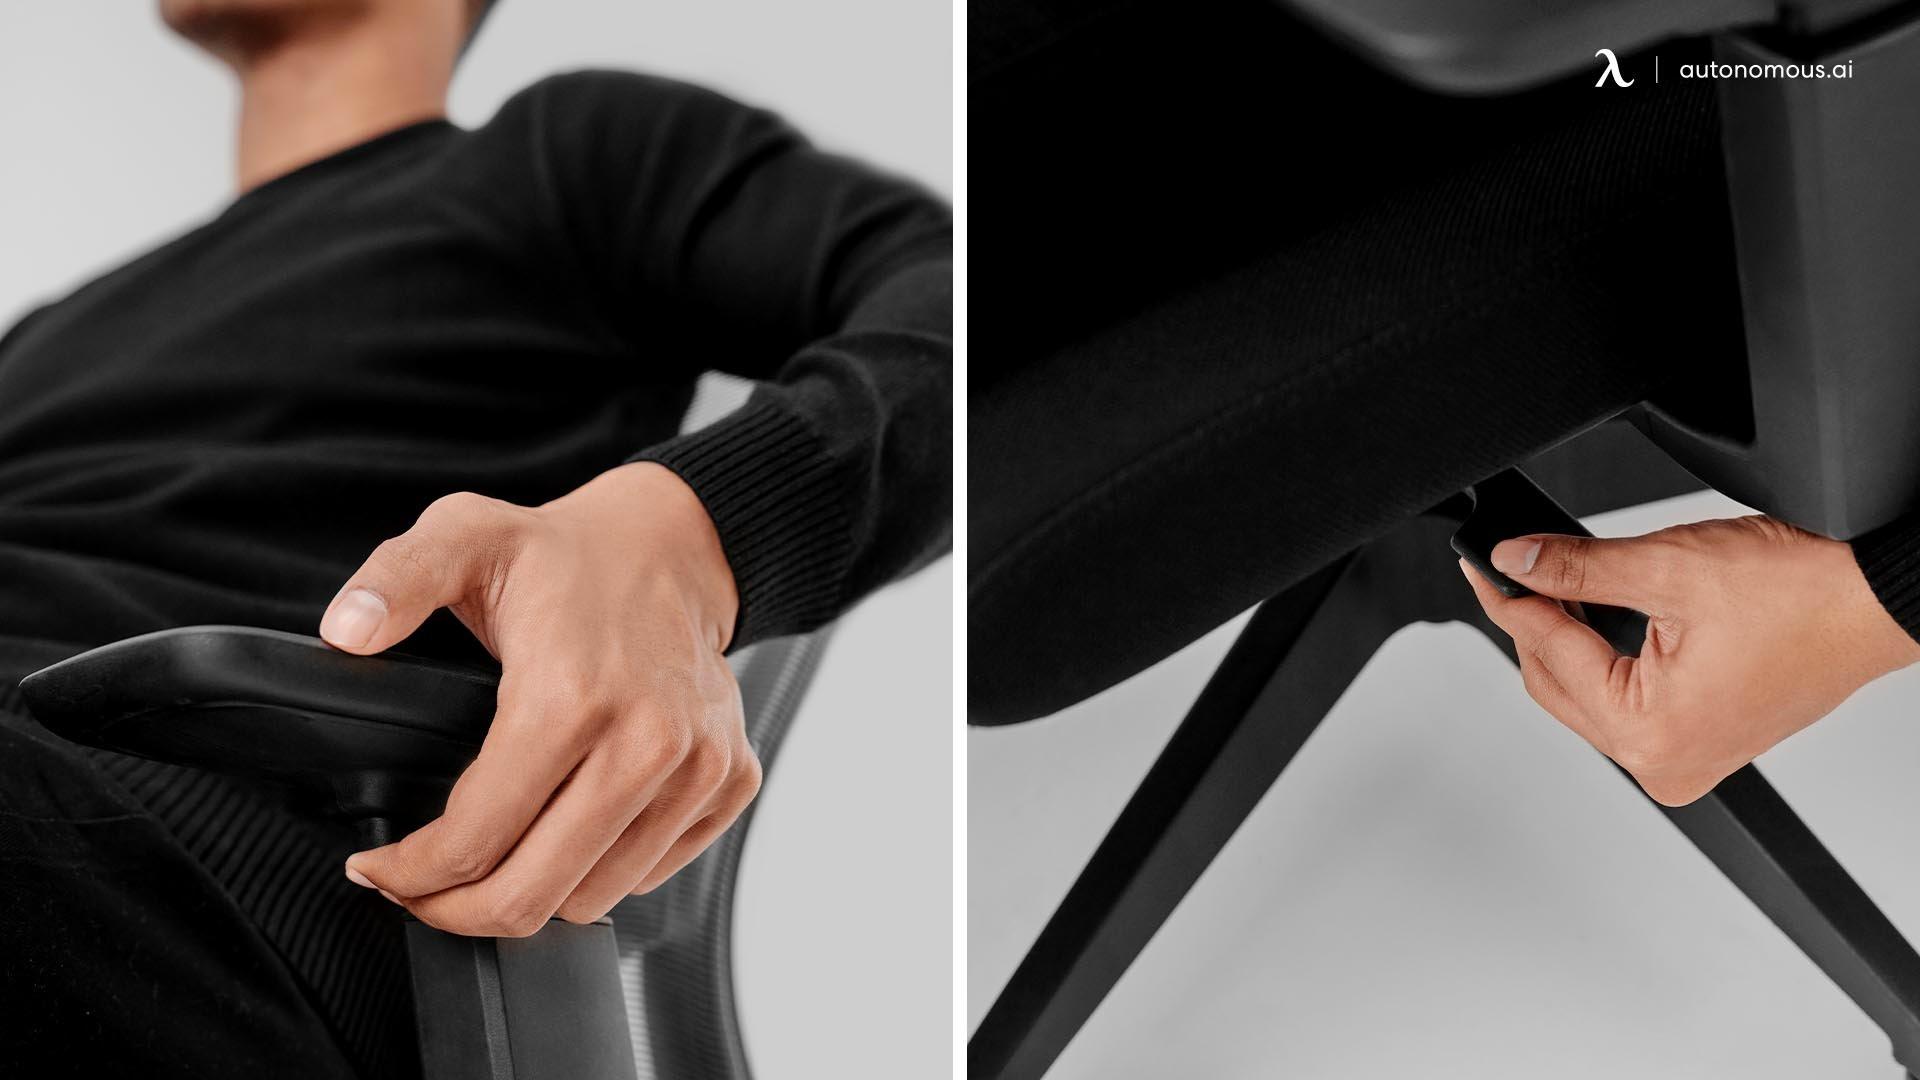 How Do You Adjust an Ergonomic Chair?